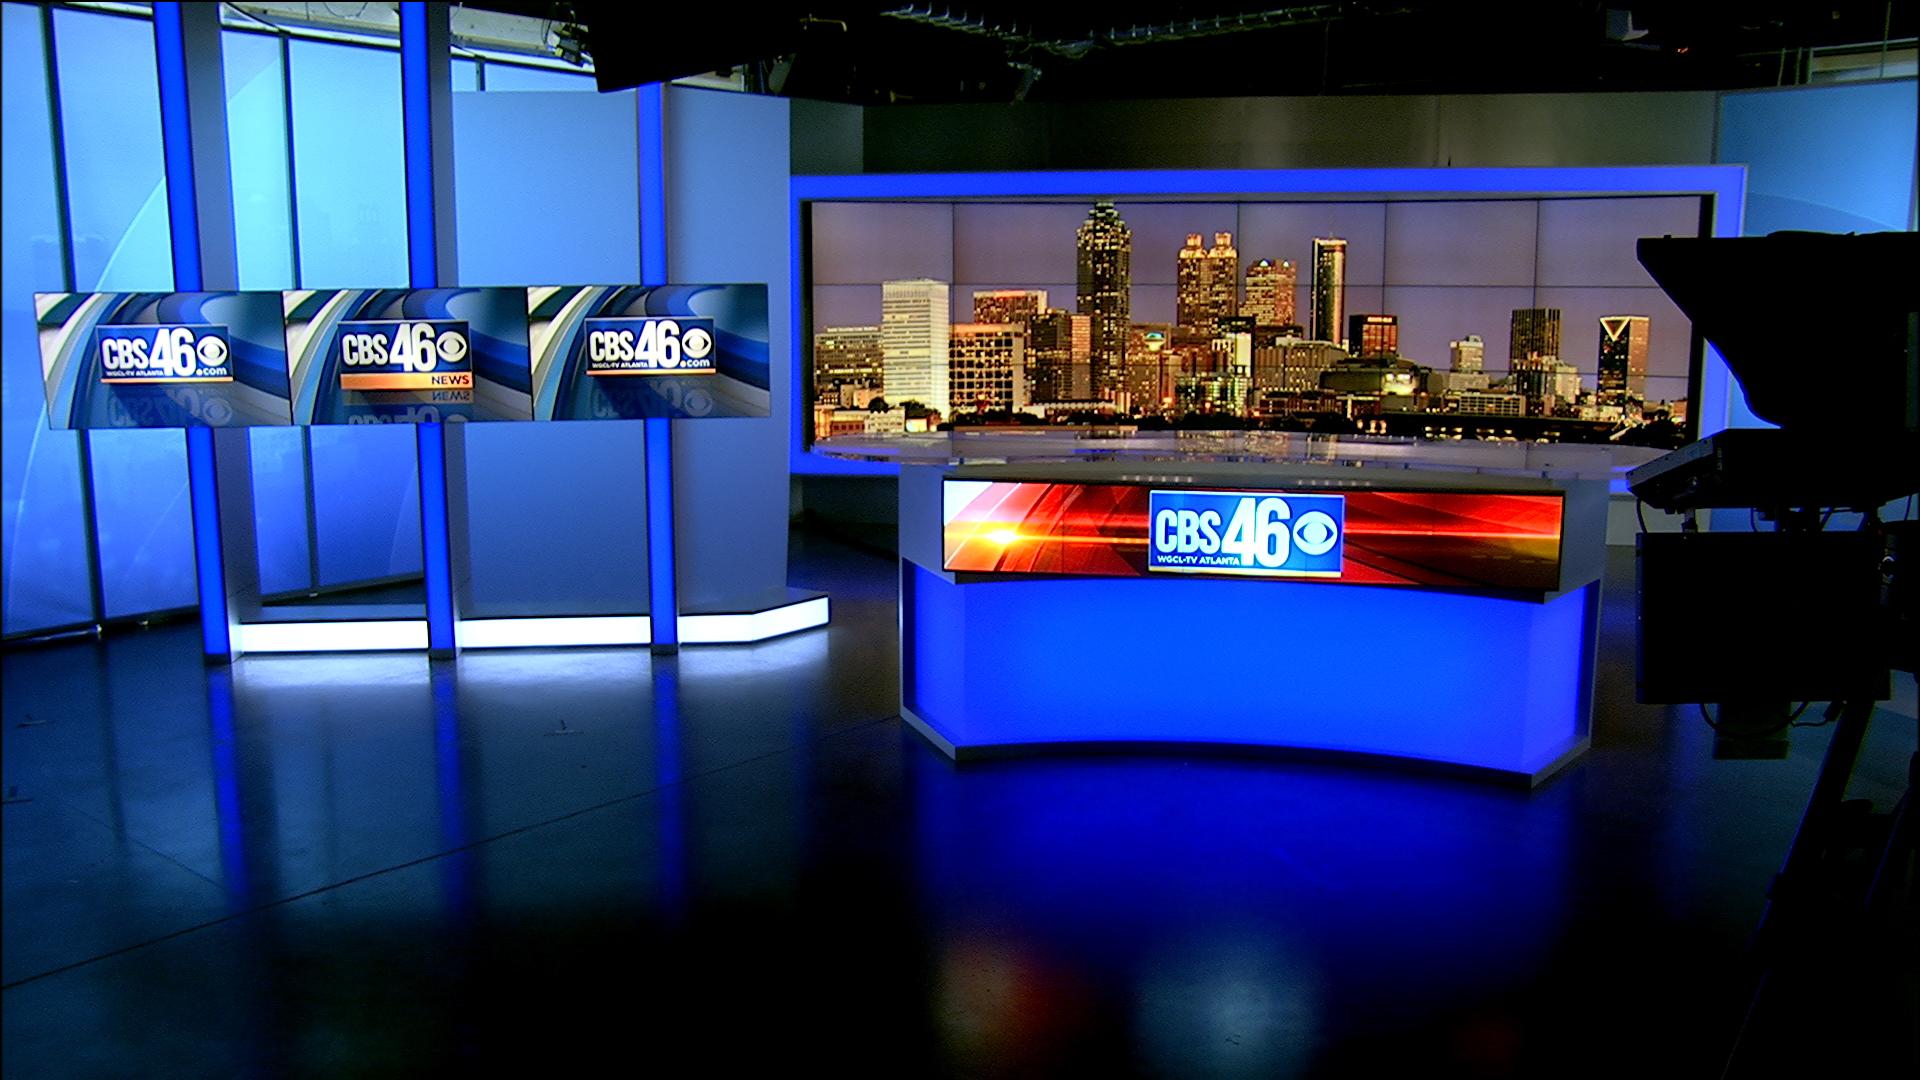 CBS46 Atlanta, Debuts New News Set: FX Design Group Designed